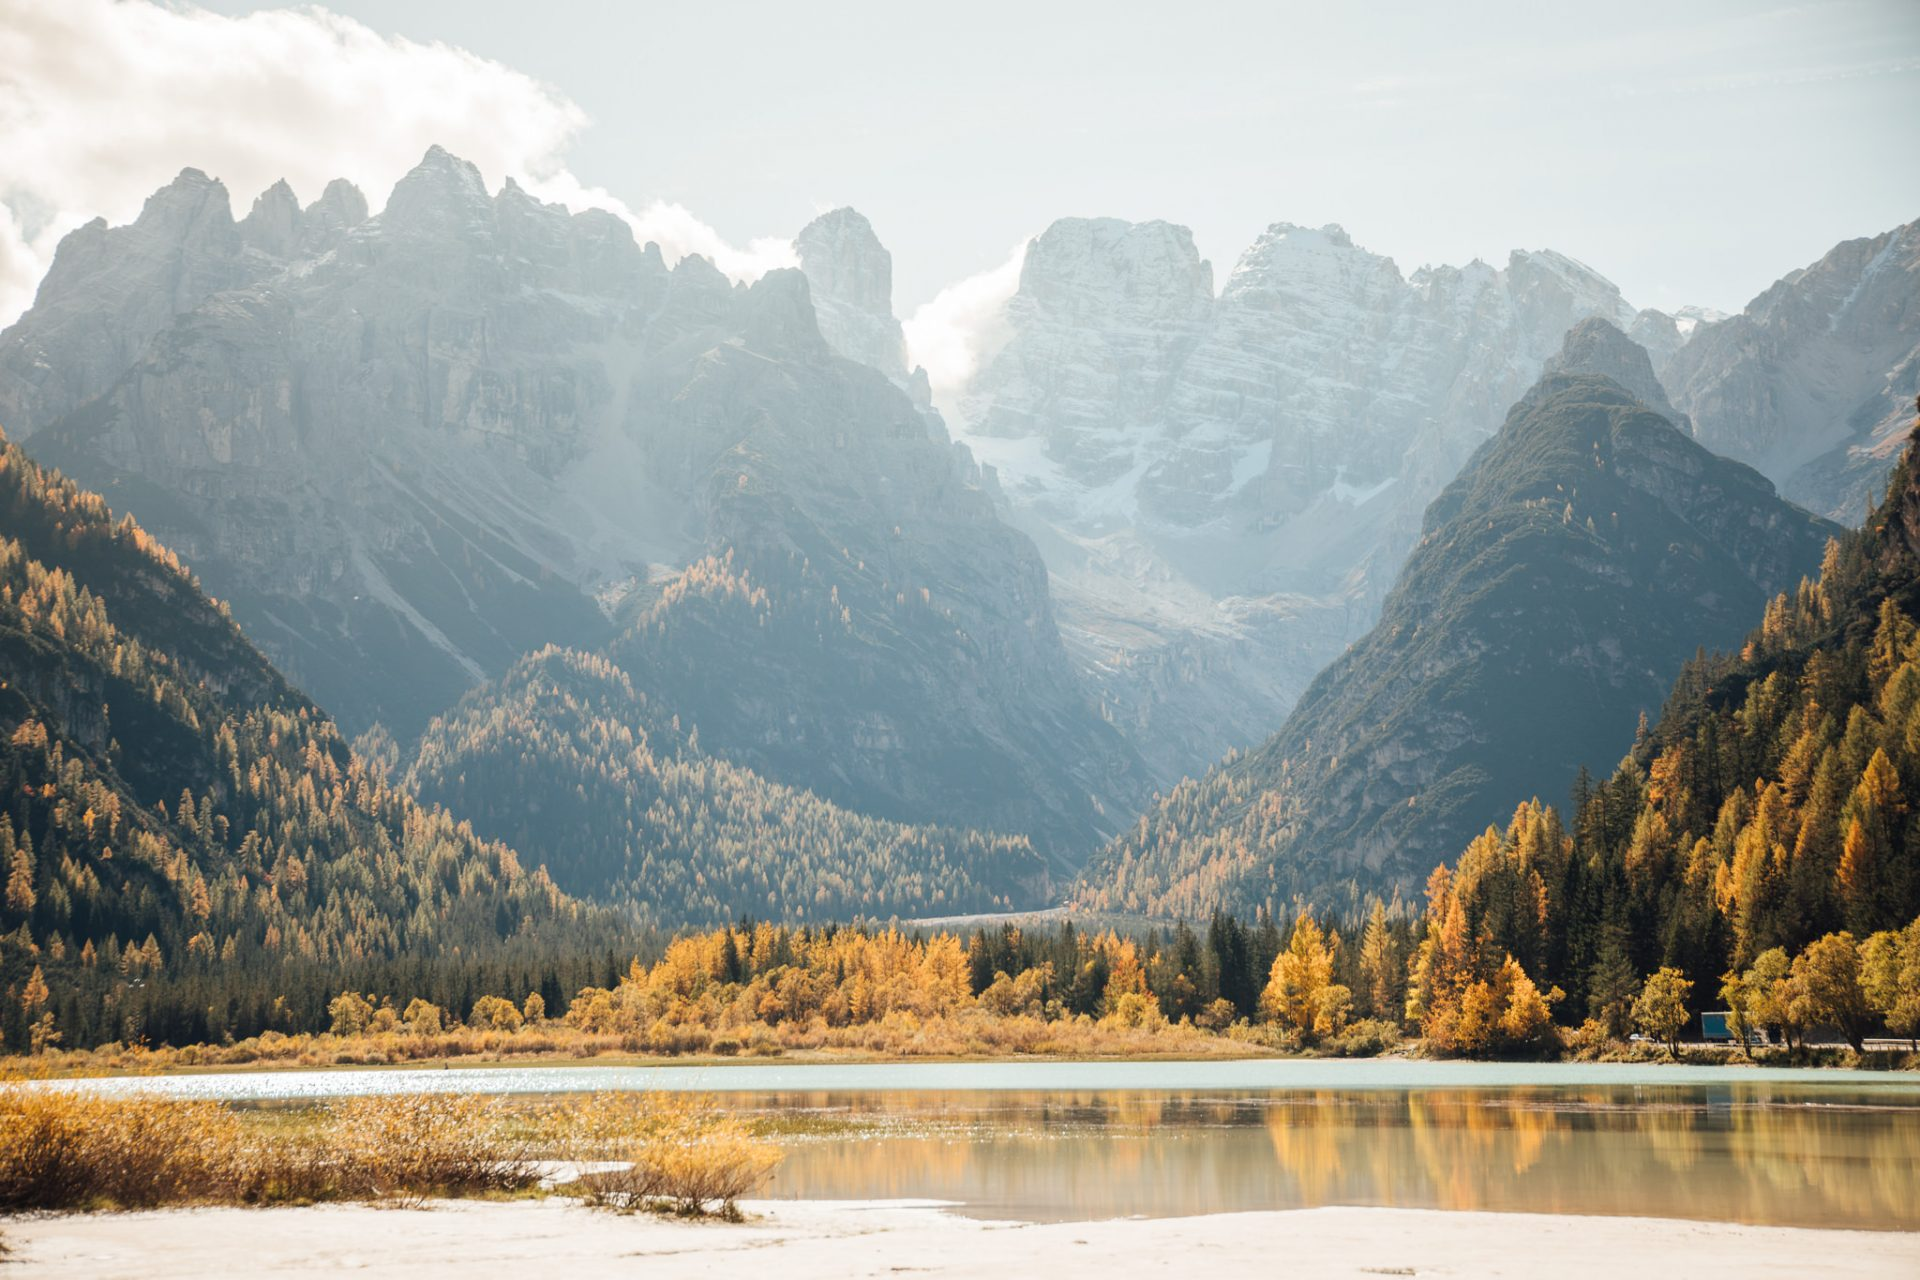 lago-di-landro-dolomity-co-zobaczyc